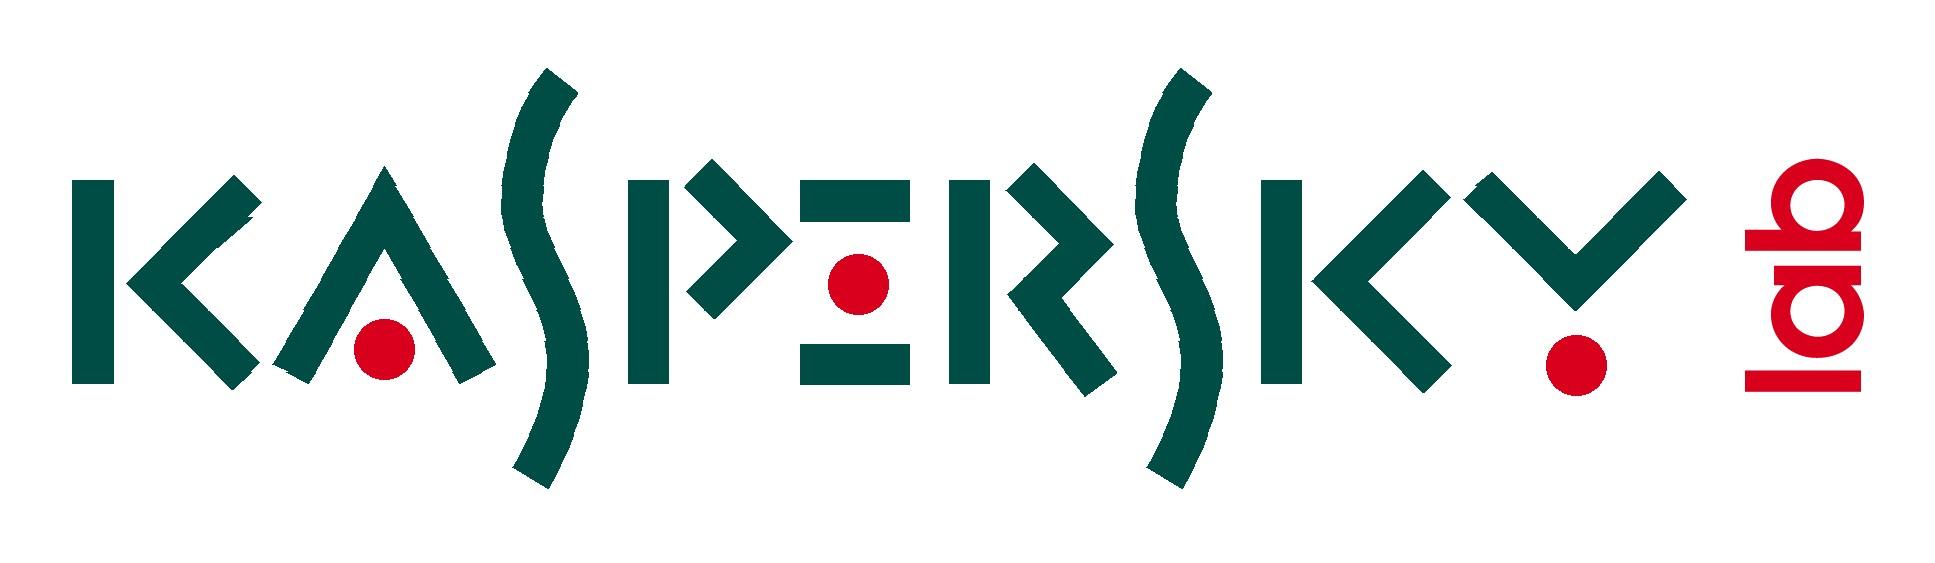 Картинки по запросу касперский логотип